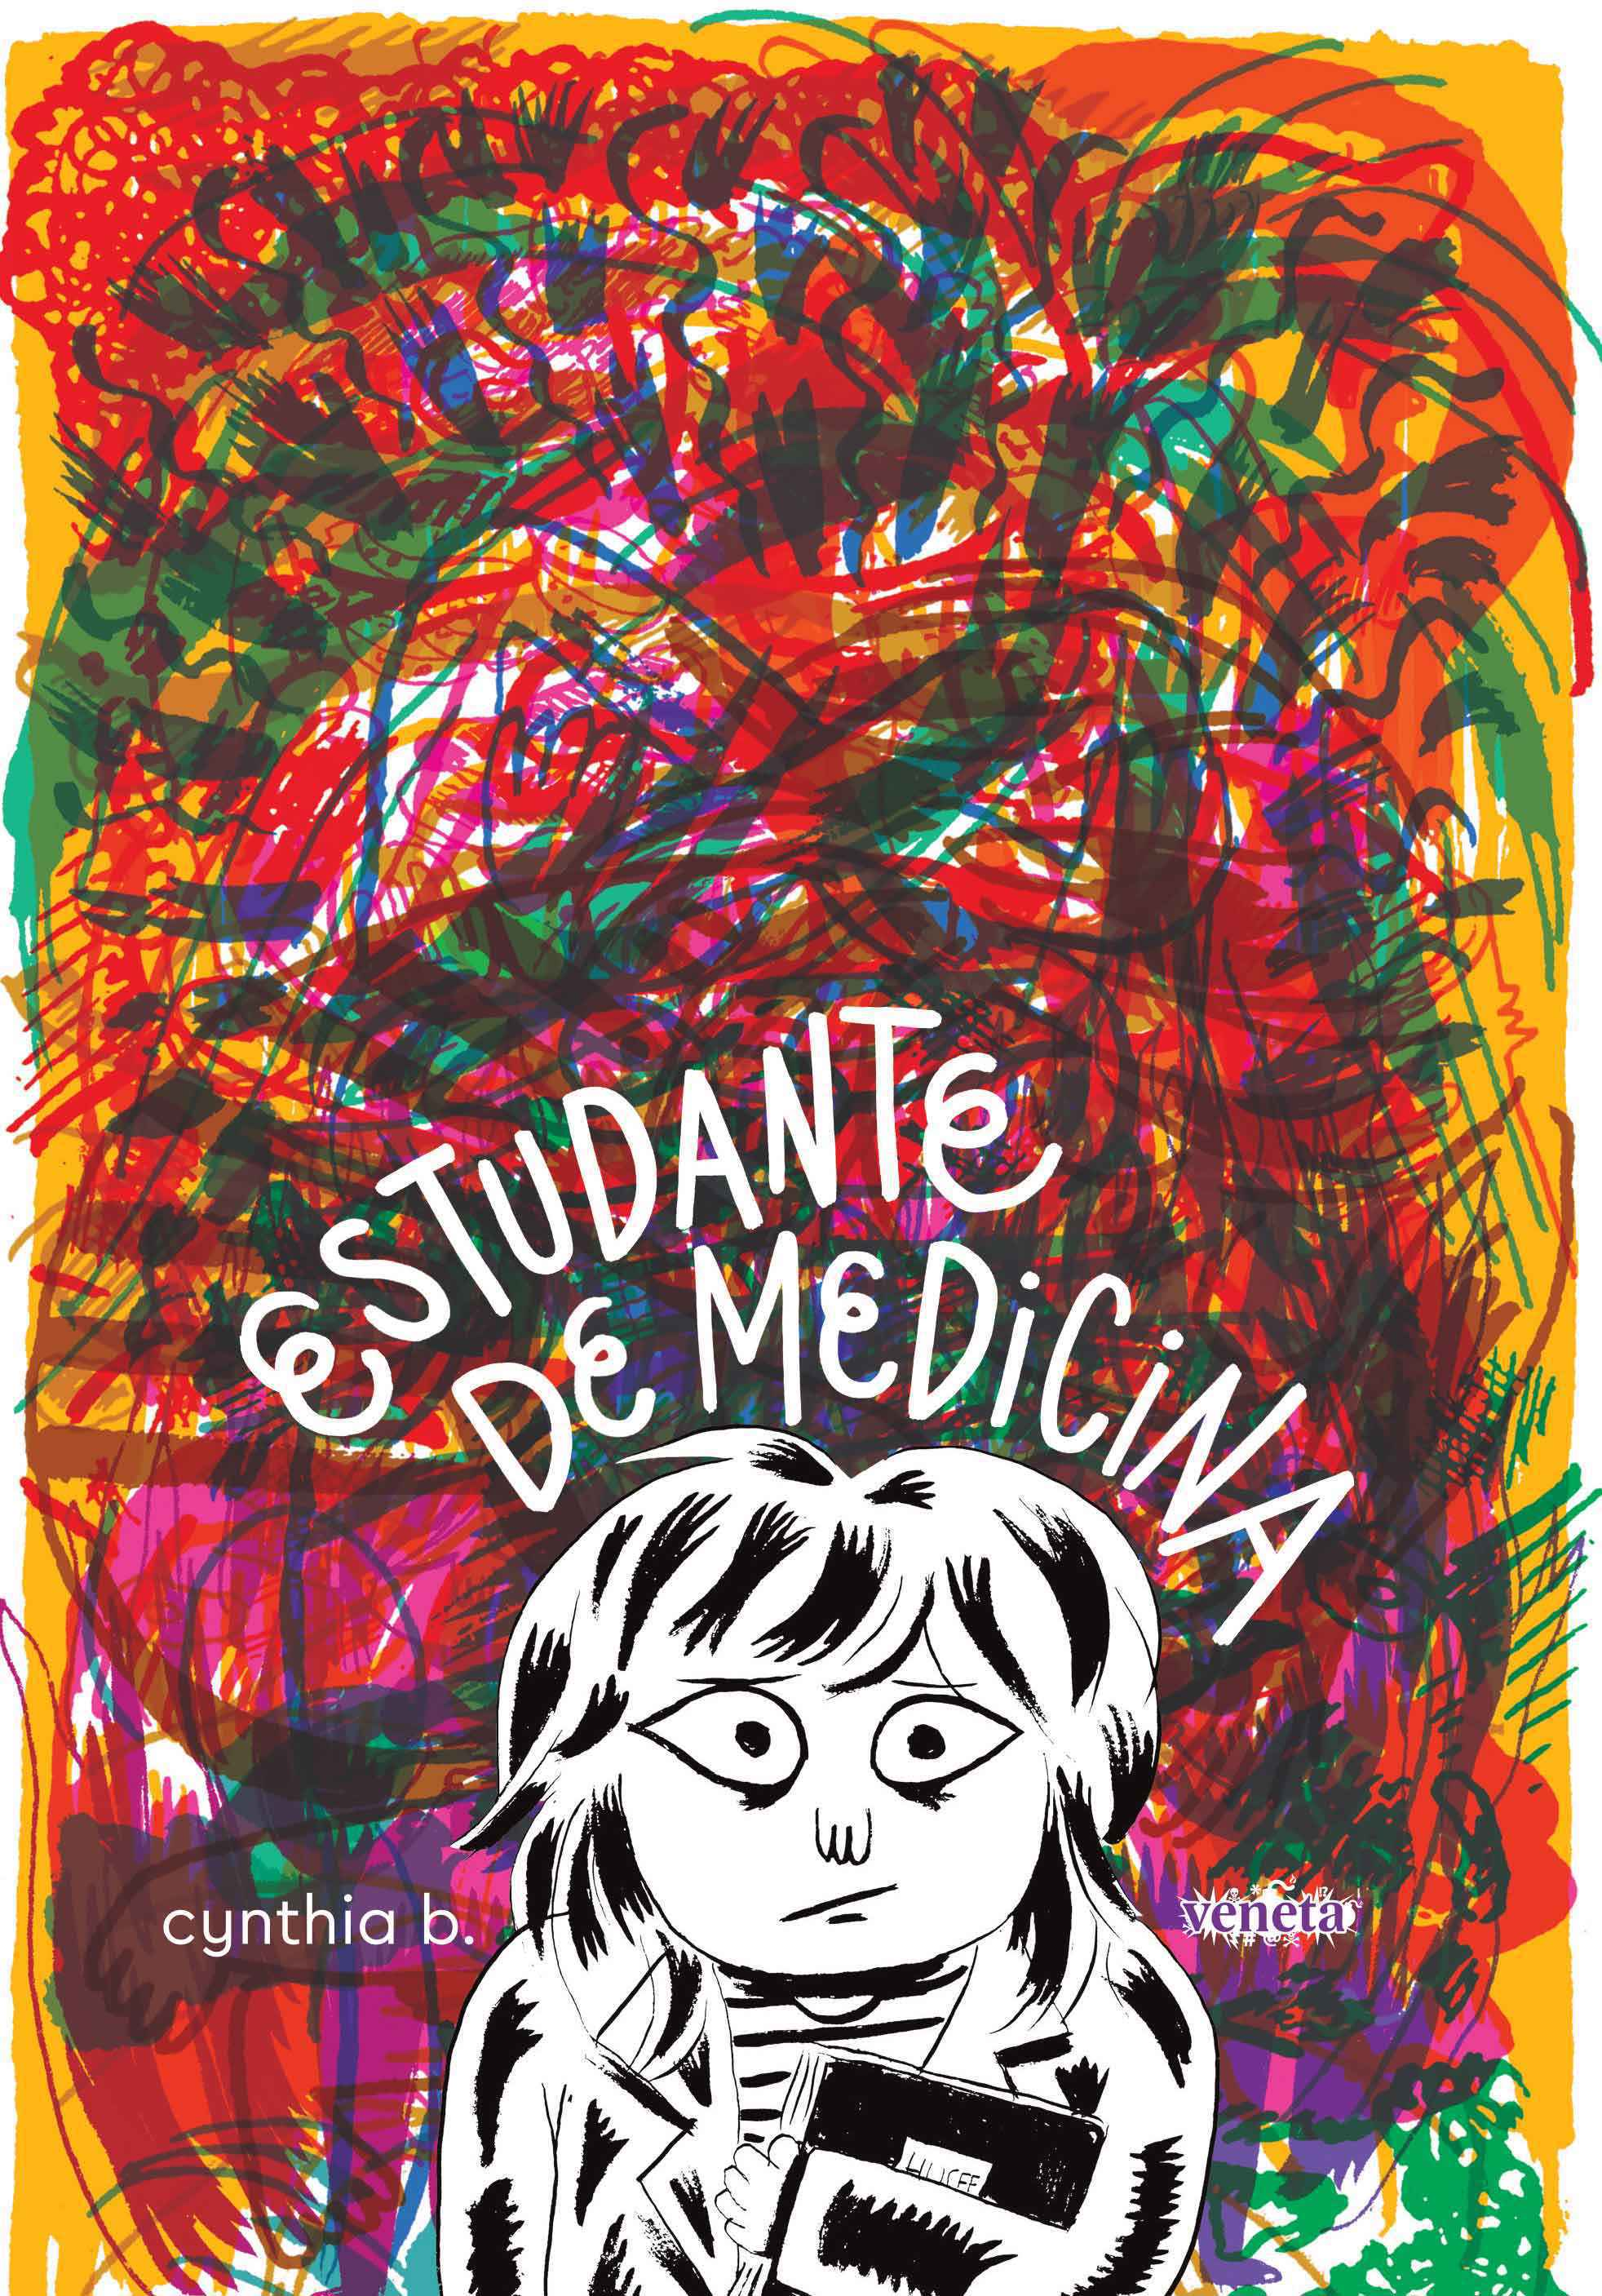 Capa do livro 'Estudante de Medicina', de Cynthia Bonacossa